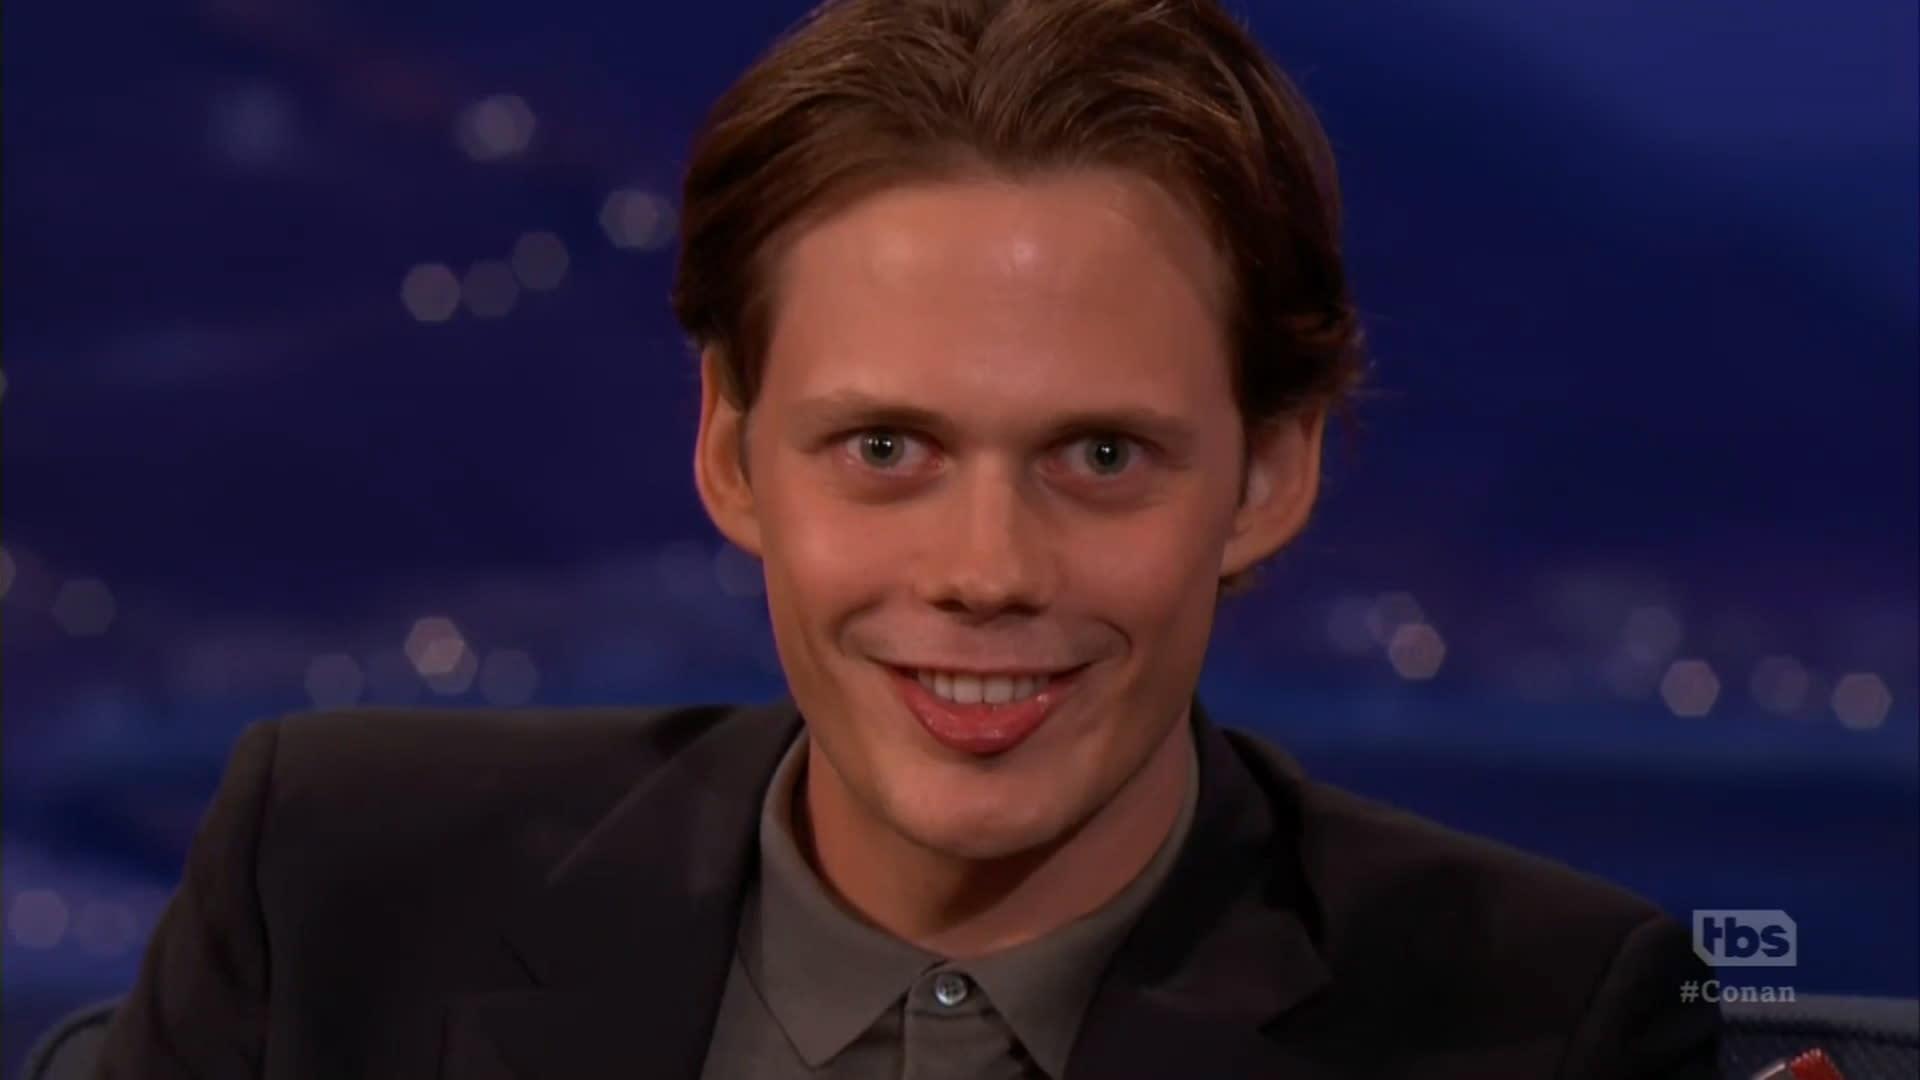 Uu 2017 Uu U >> 'It' star Bill Skarsgård explains creepy clown smile [Video]